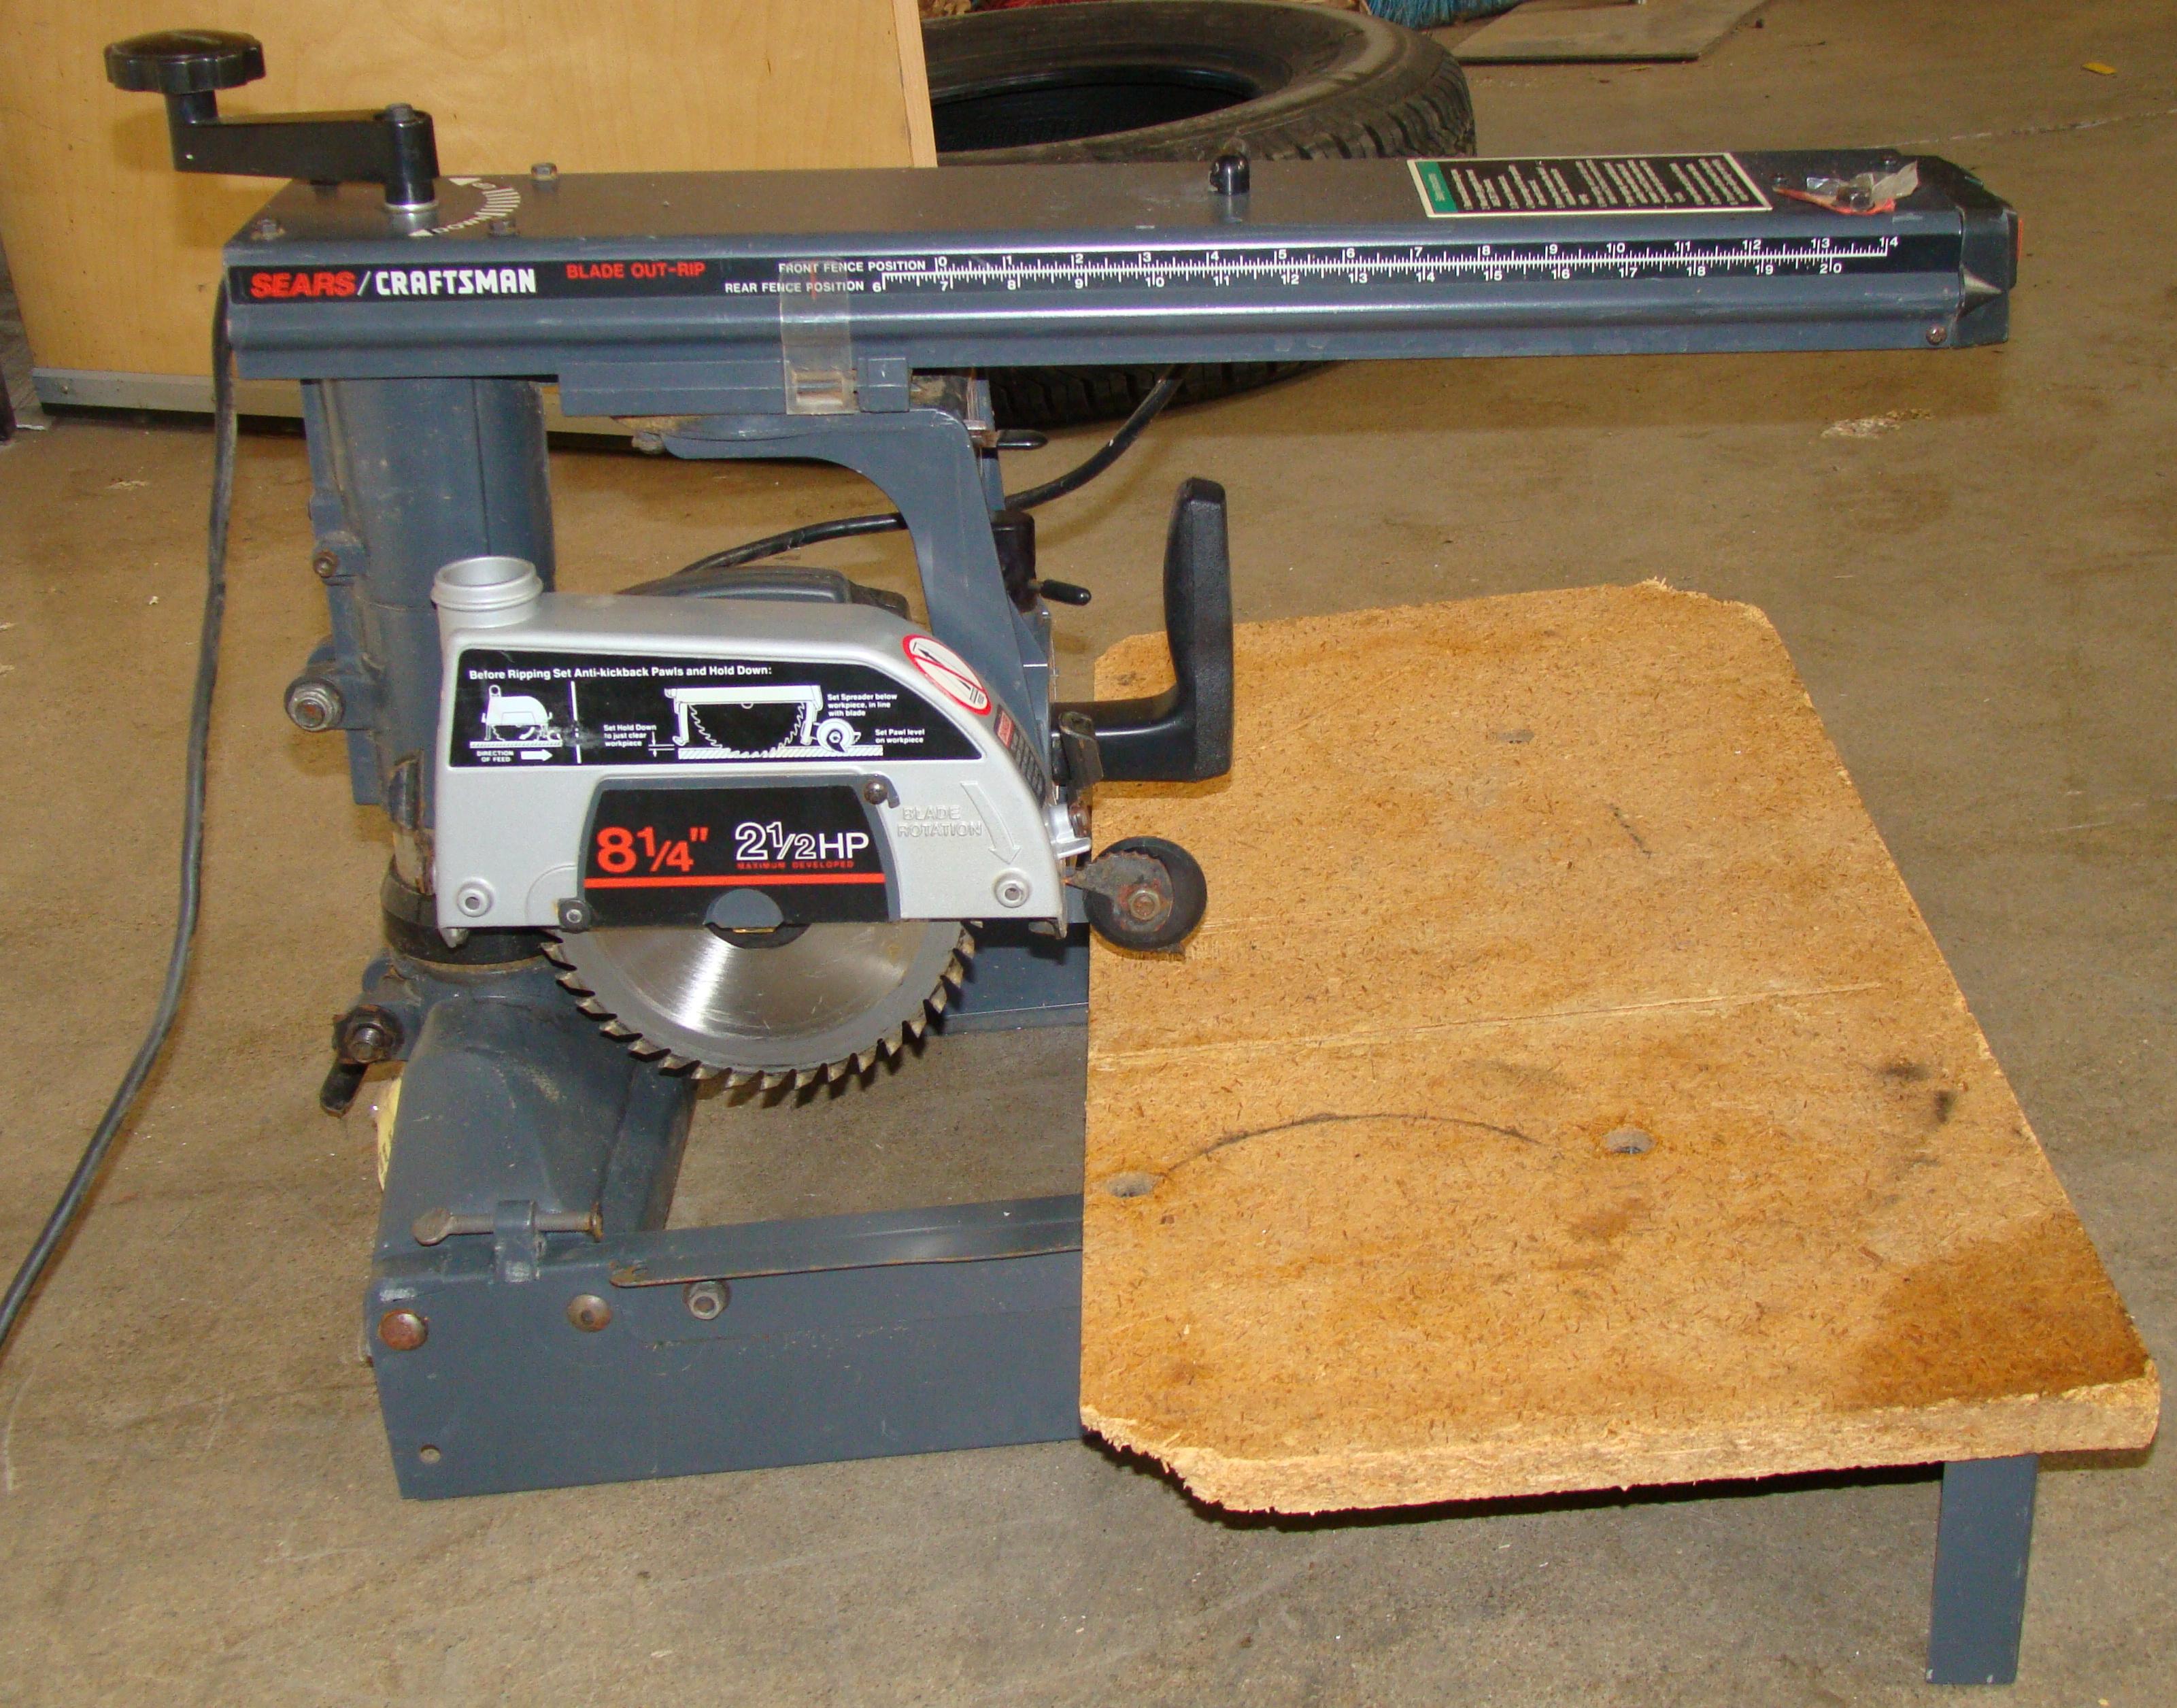 "Craftsman 8-1/4"" Radial Arm Saw 120 Volt - Image 2 of 5"